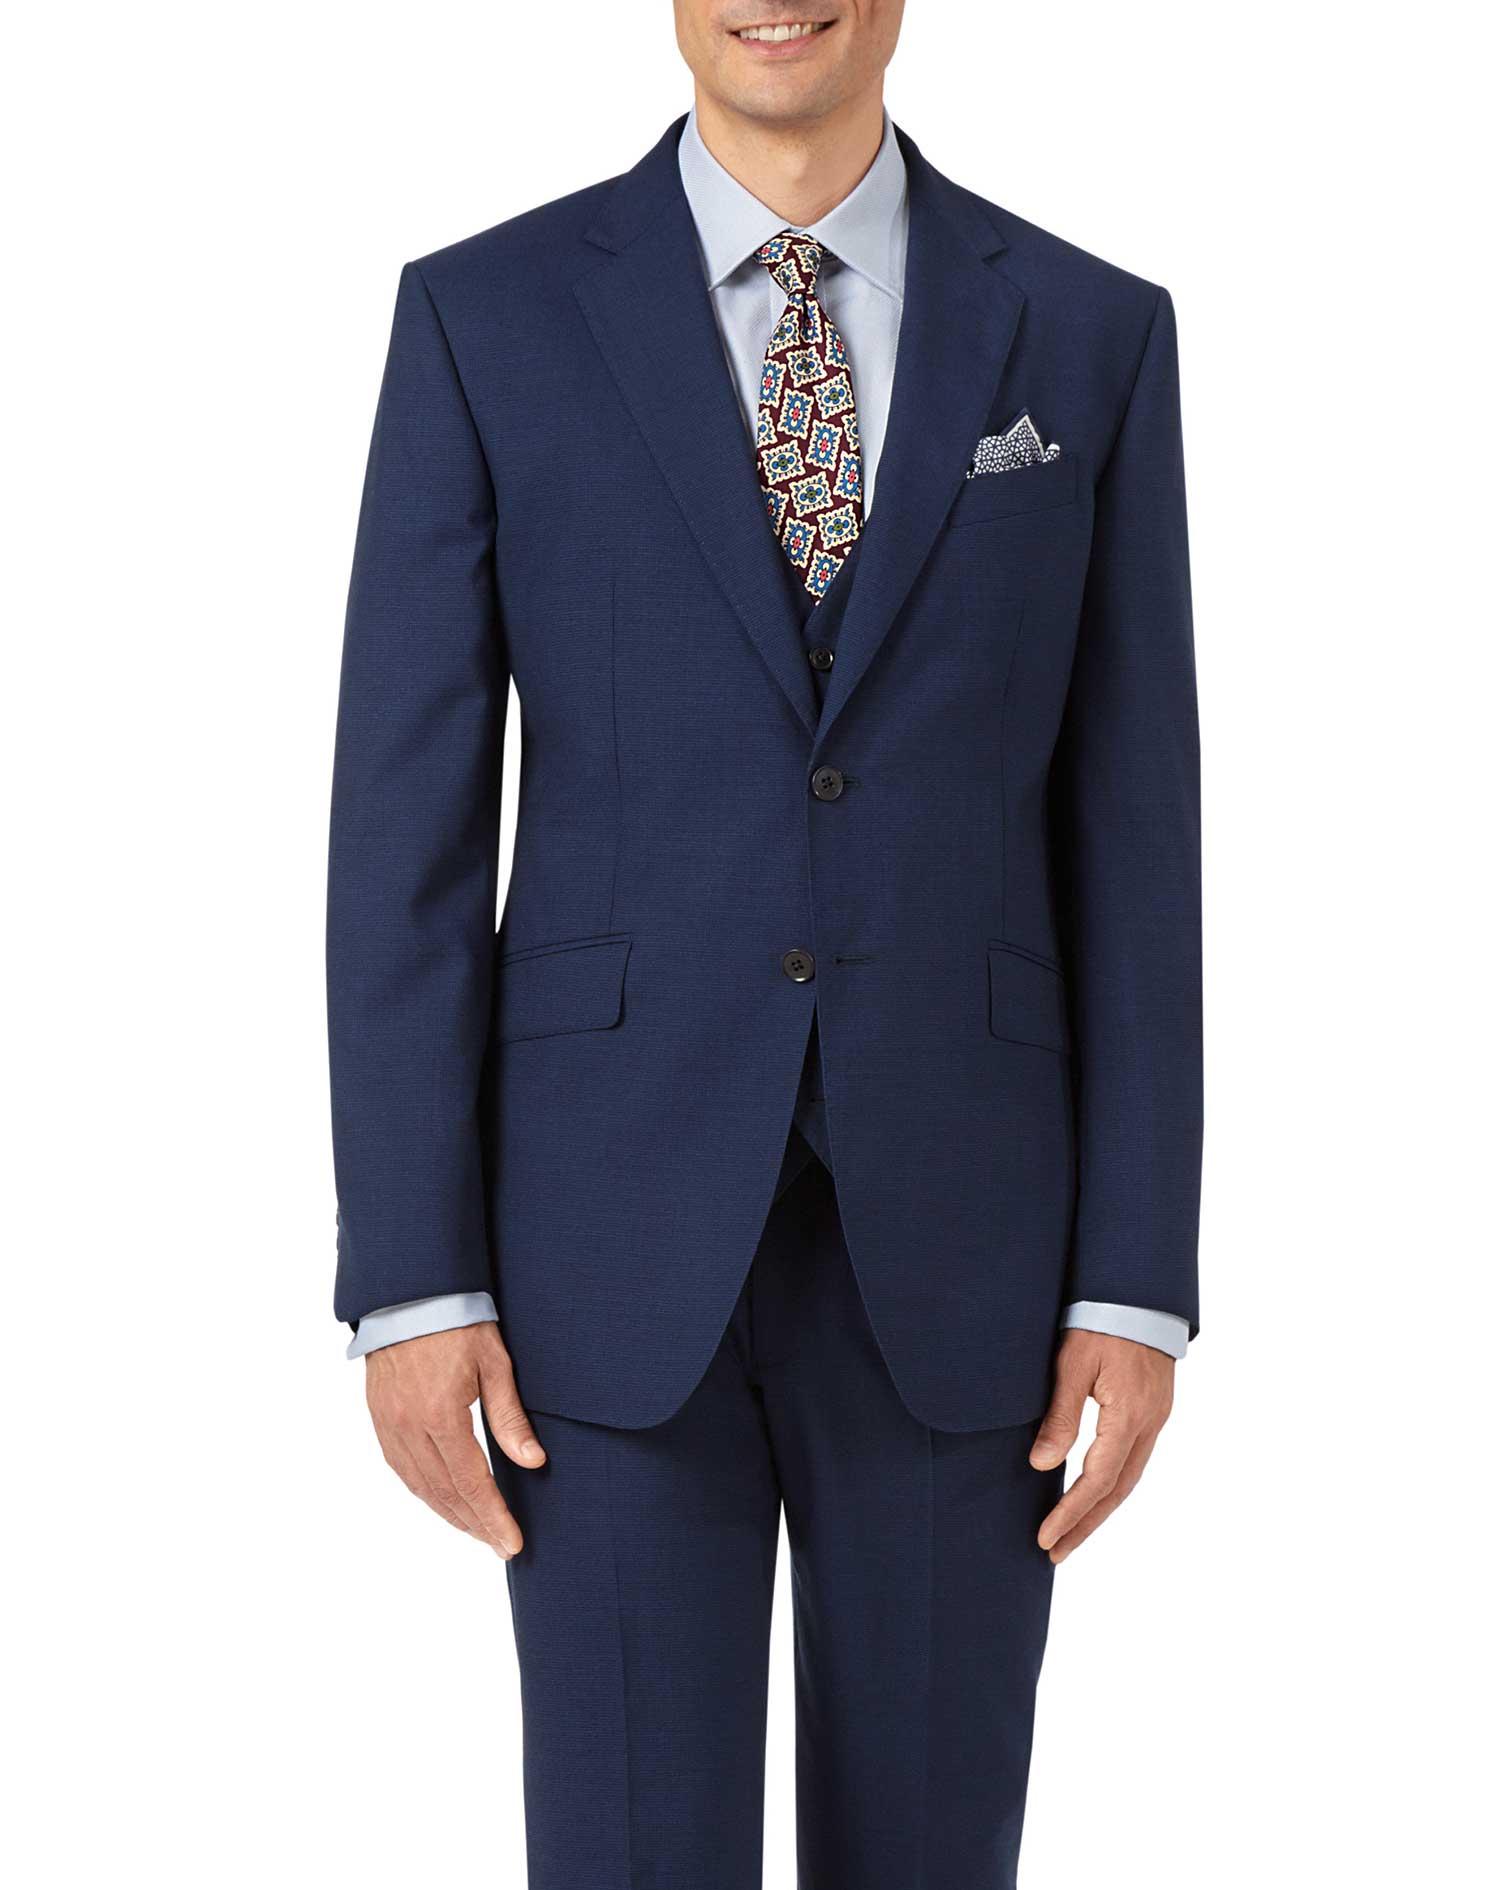 Indigo Blue Slim Fit Panama Puppytooth Business Suit Wool Jacket Size 36 Regular by Charles Tyrwhitt